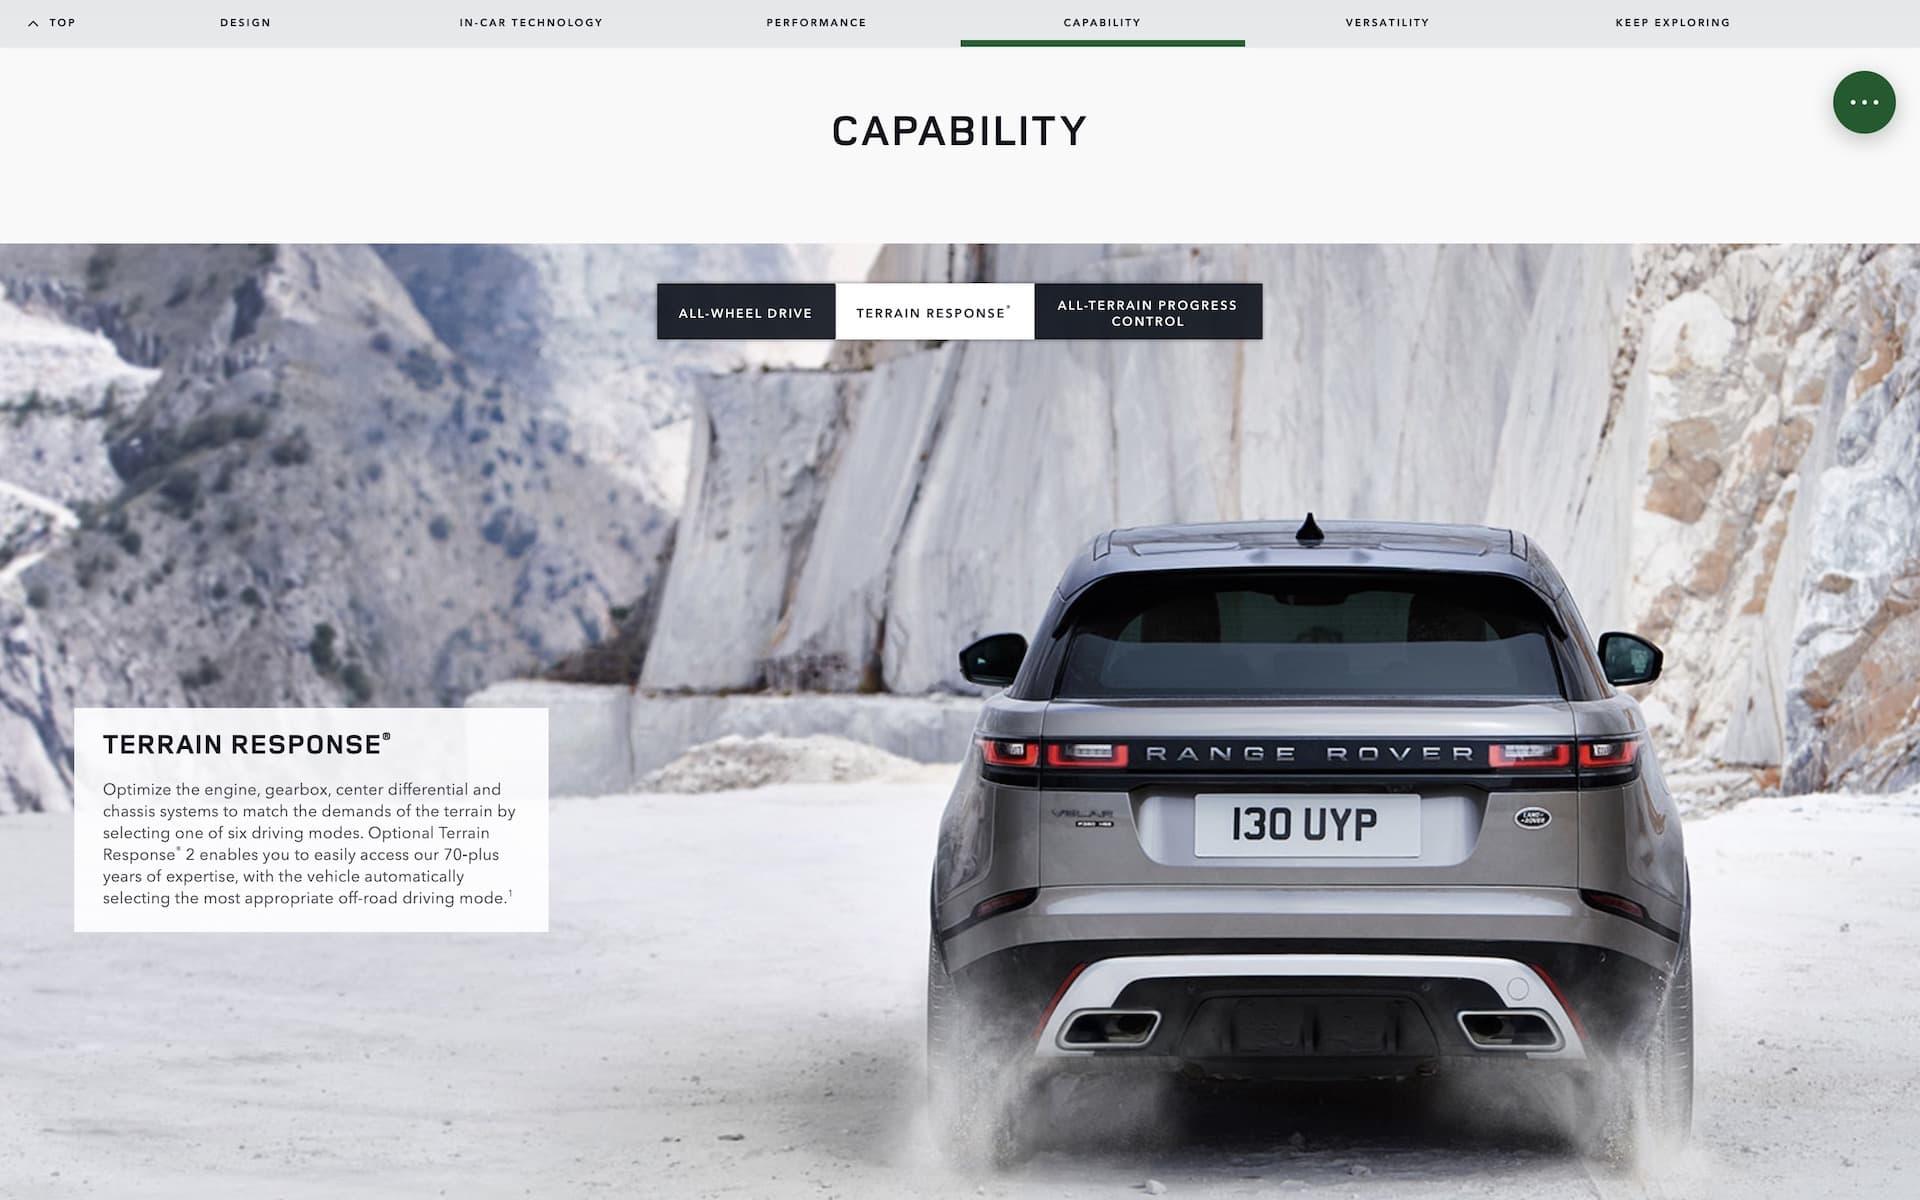 Range Rover Velar Webpage Screenshot